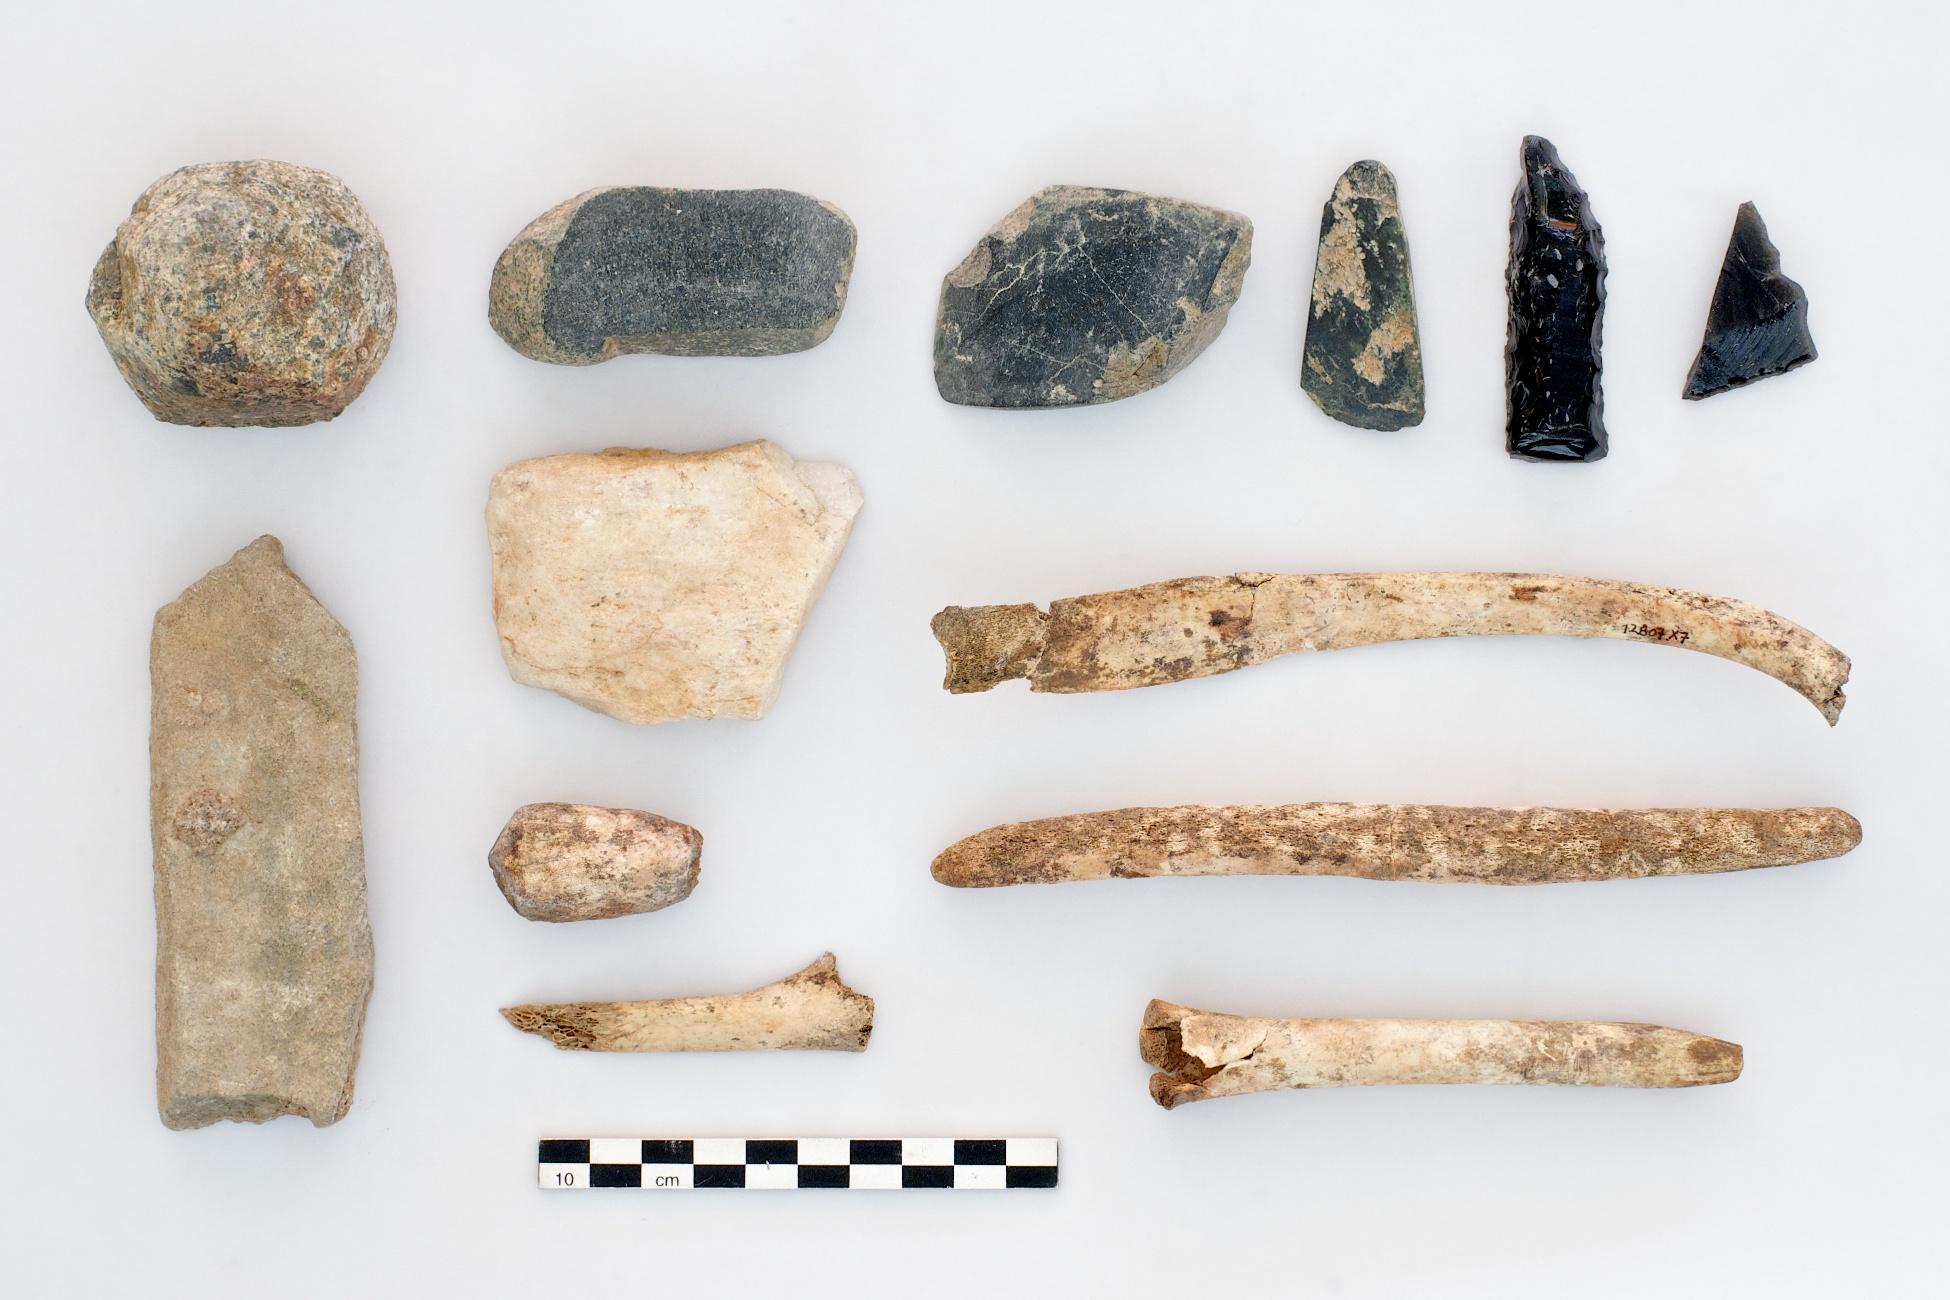 Cluster of worked bone, flint, and obsidian, Çatalhöyük, Turkey.